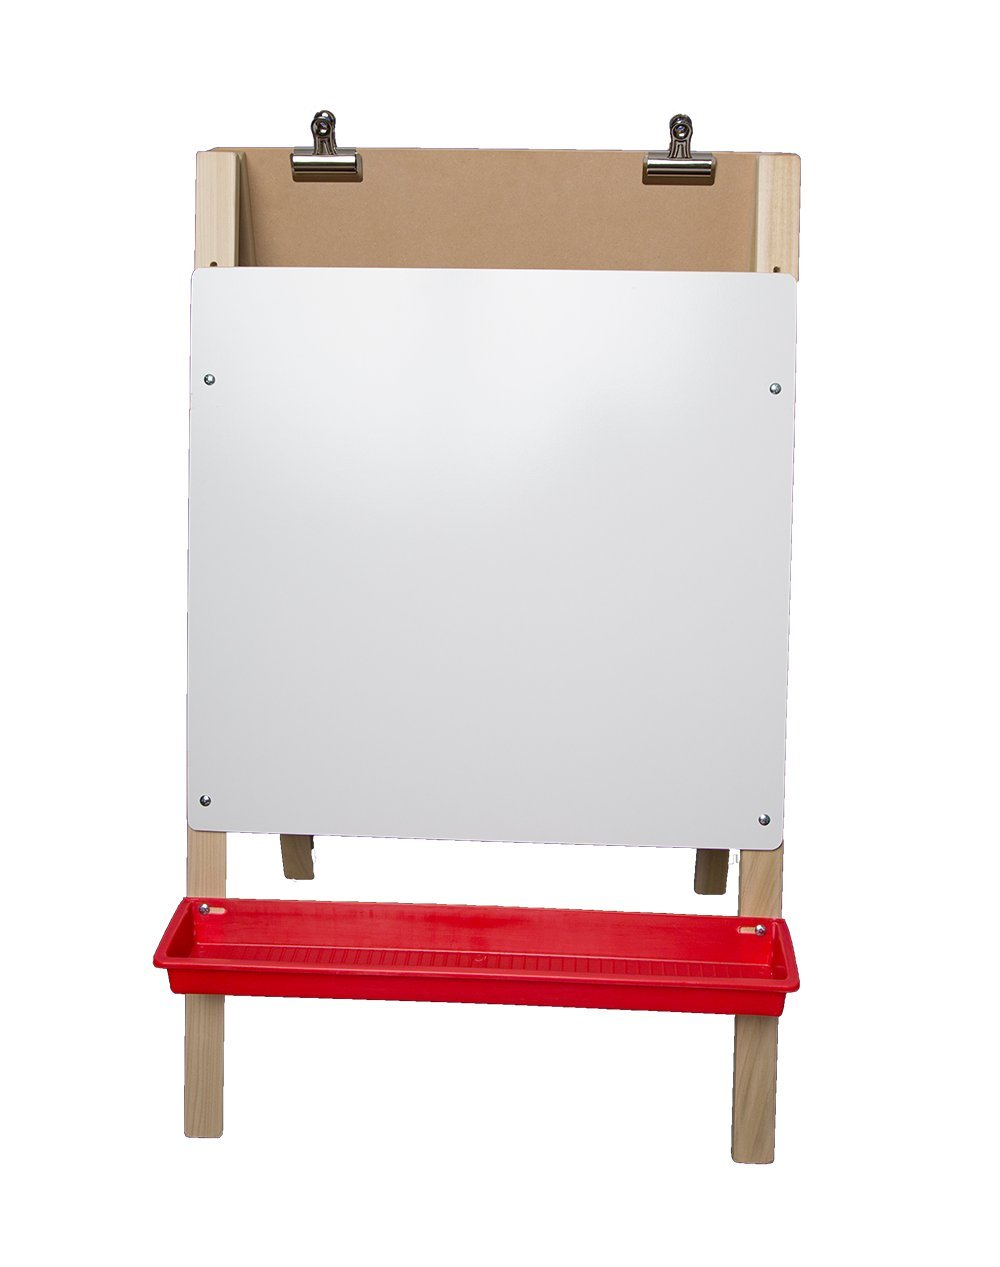 Crestline Products Natural Wood Child's Preschool Easel (White Dry Erase & Hardwood Panel) - 40'' H x 24'' W